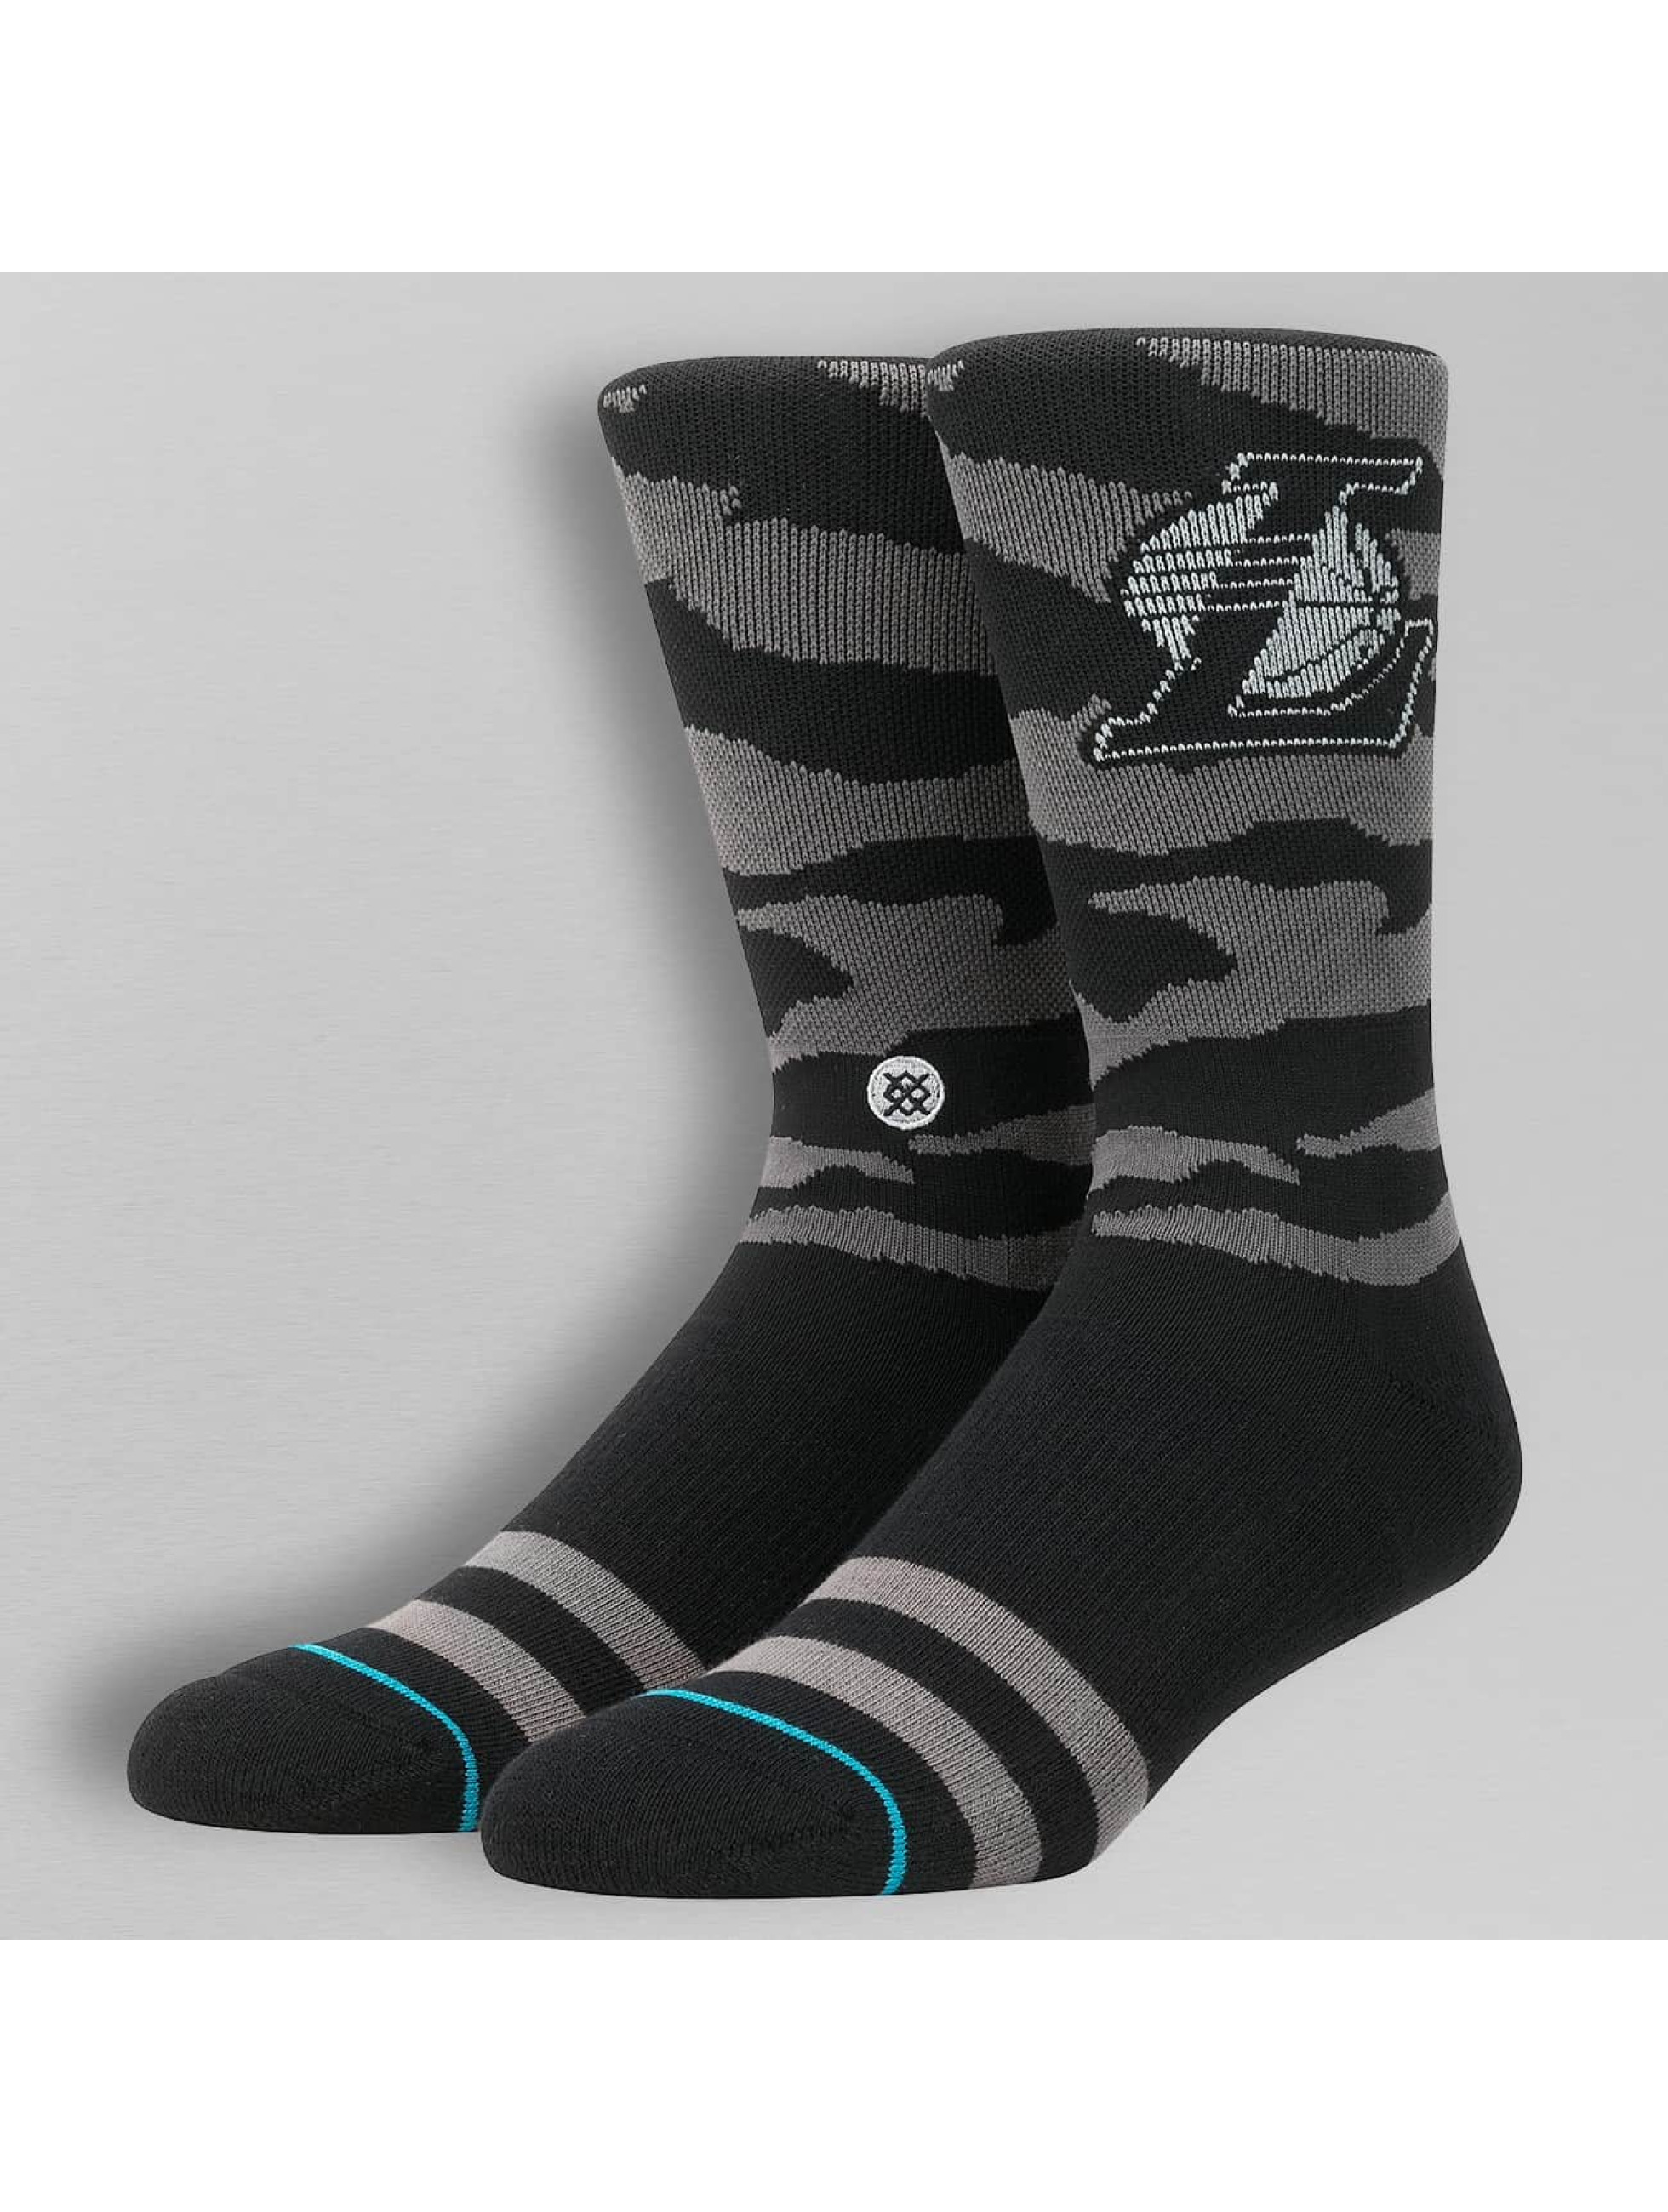 Stance Socks Nightfall Lakers black